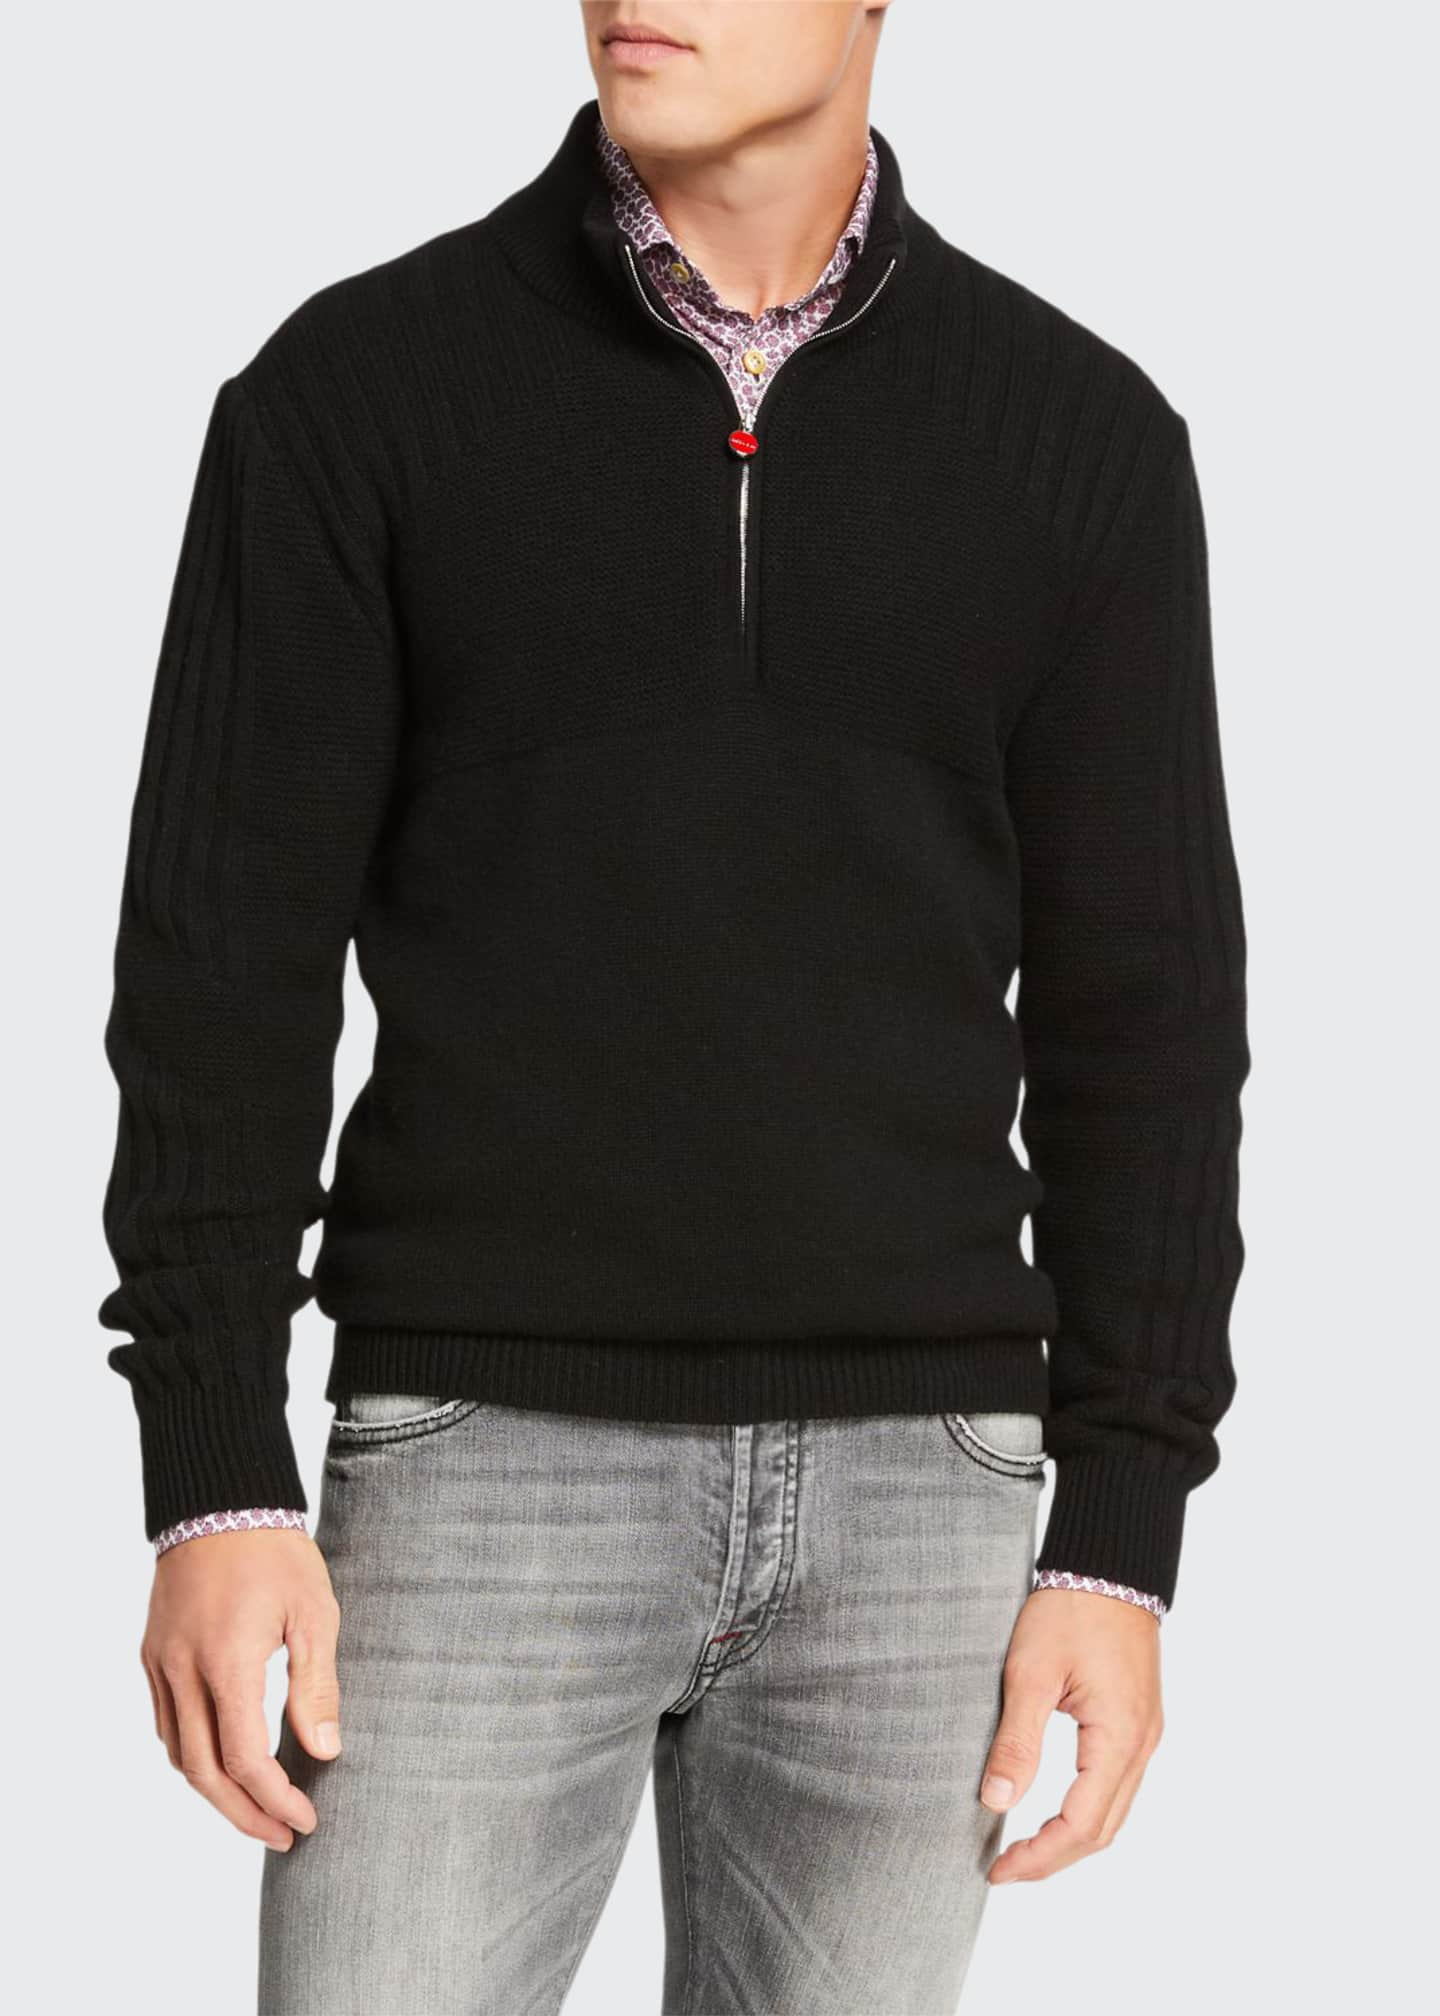 Kiton Men's Quarter-Zip Cashmere Sweater